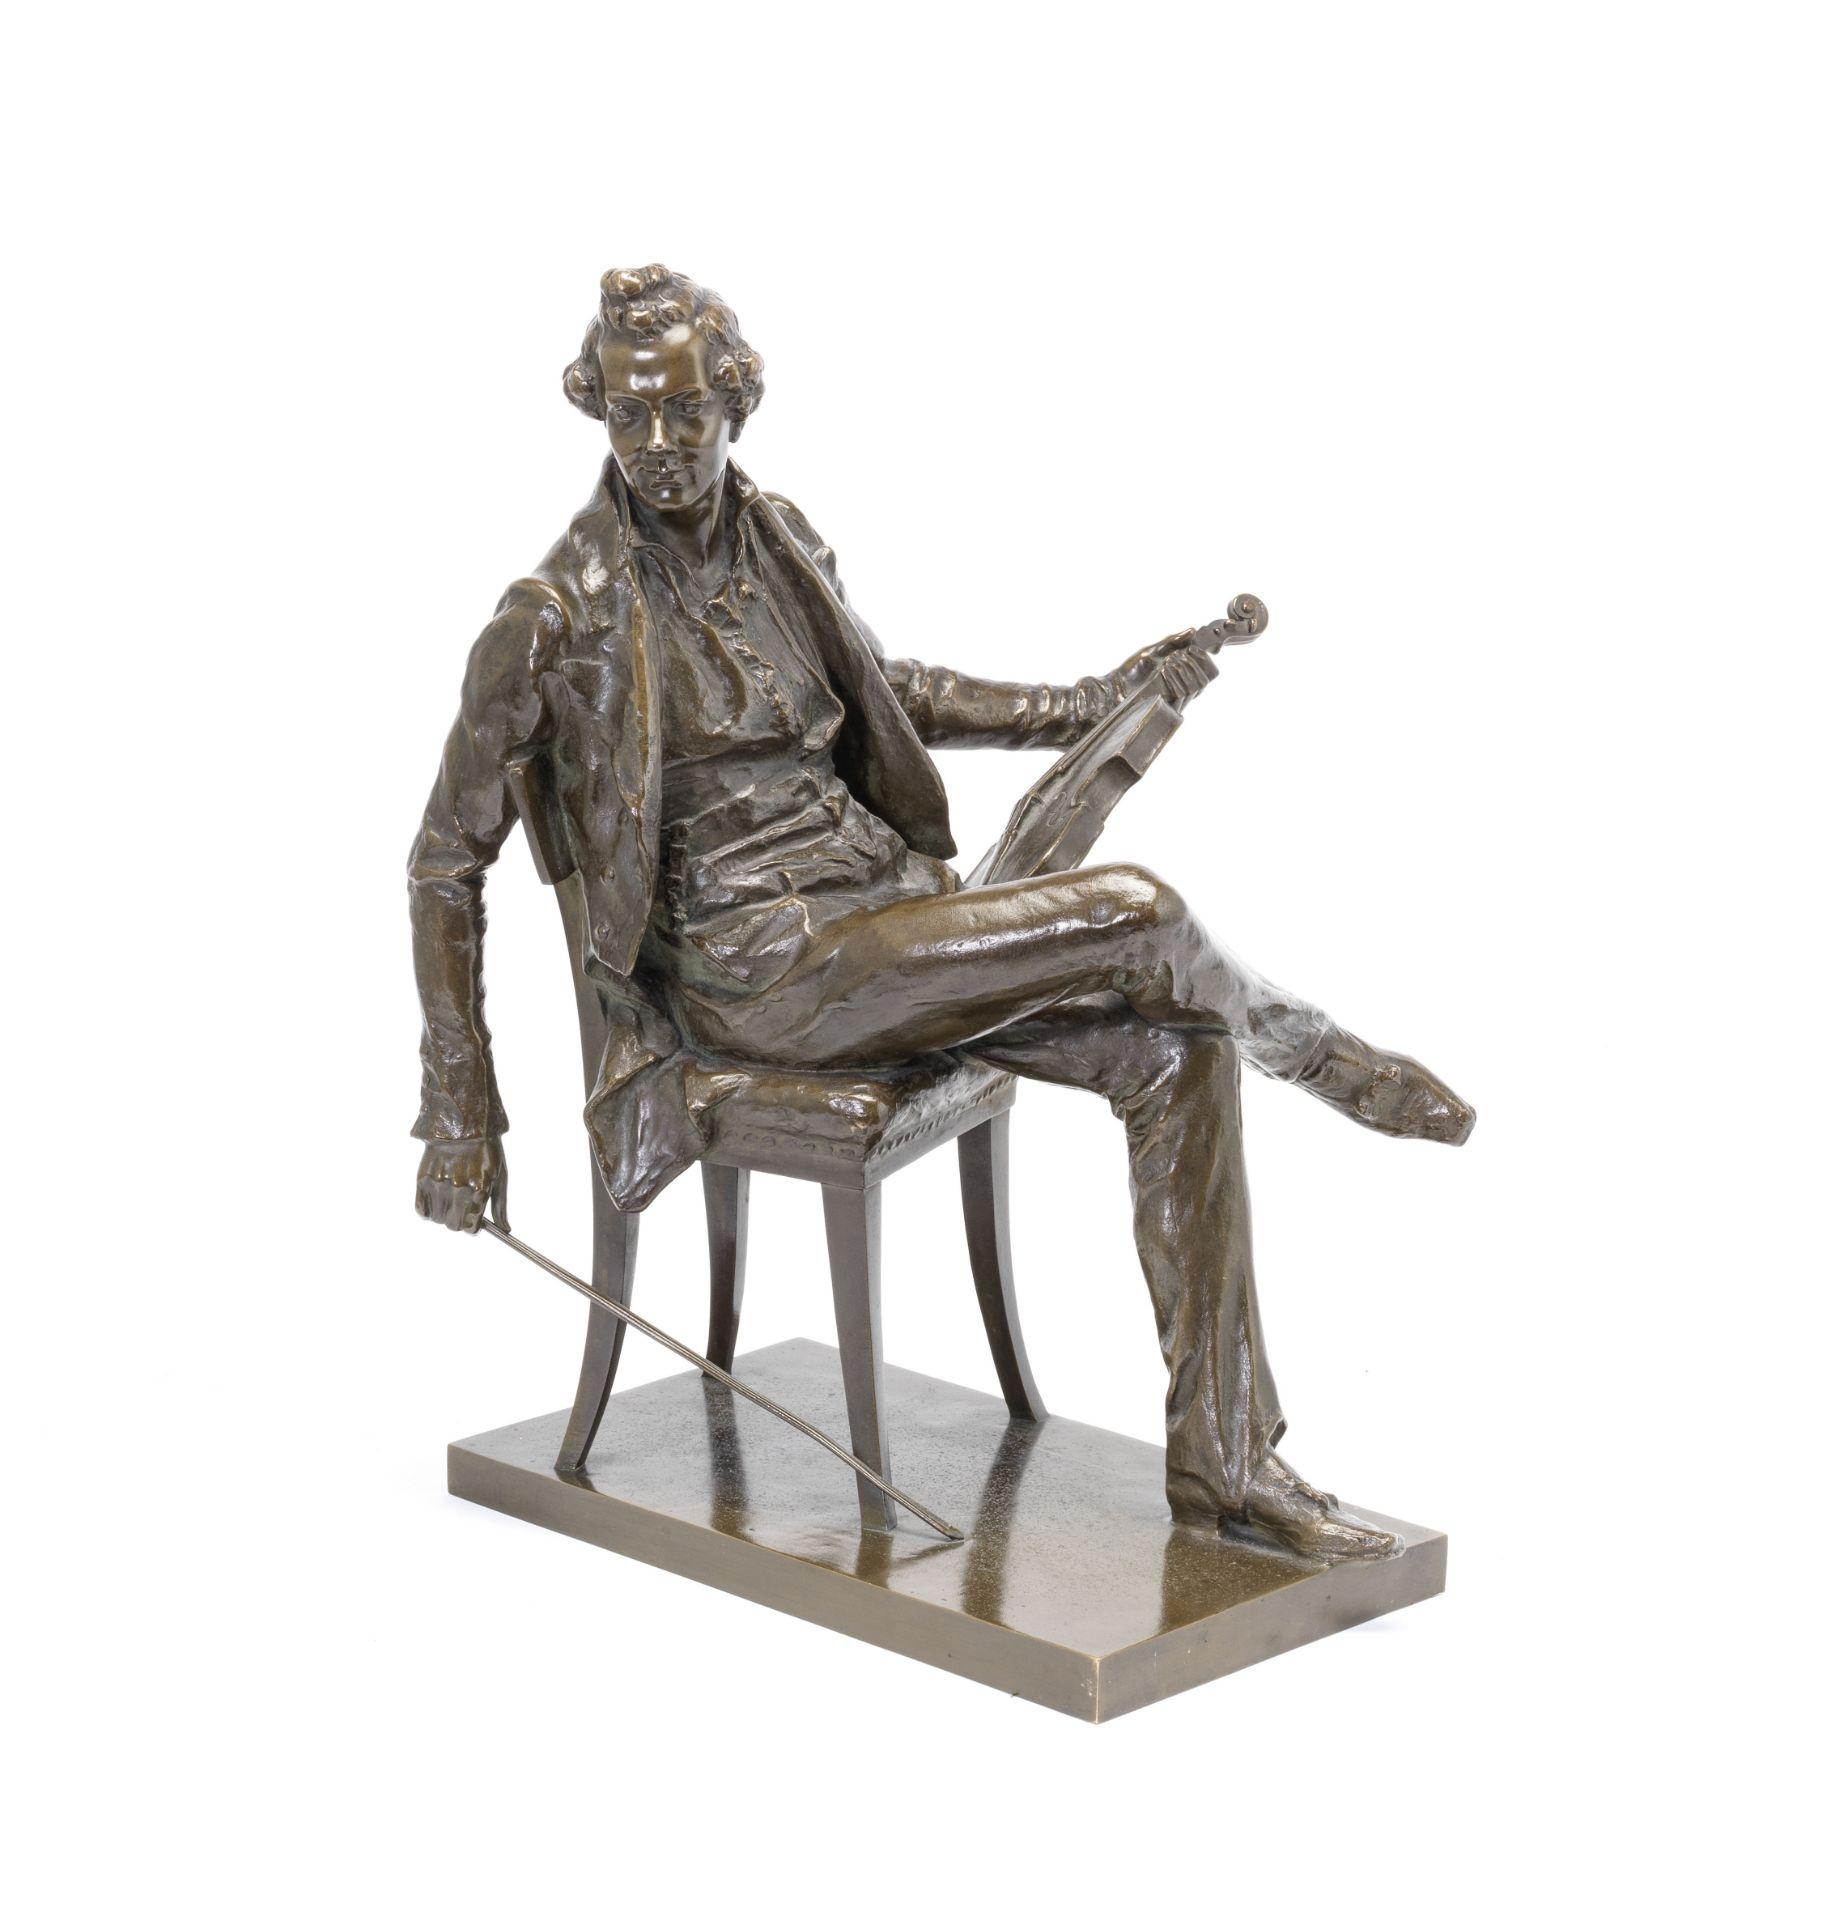 Los 168 - Franz Seifert (Austrian, 1866 -1951): a patinated bronze portrait figure of Josef Lanner